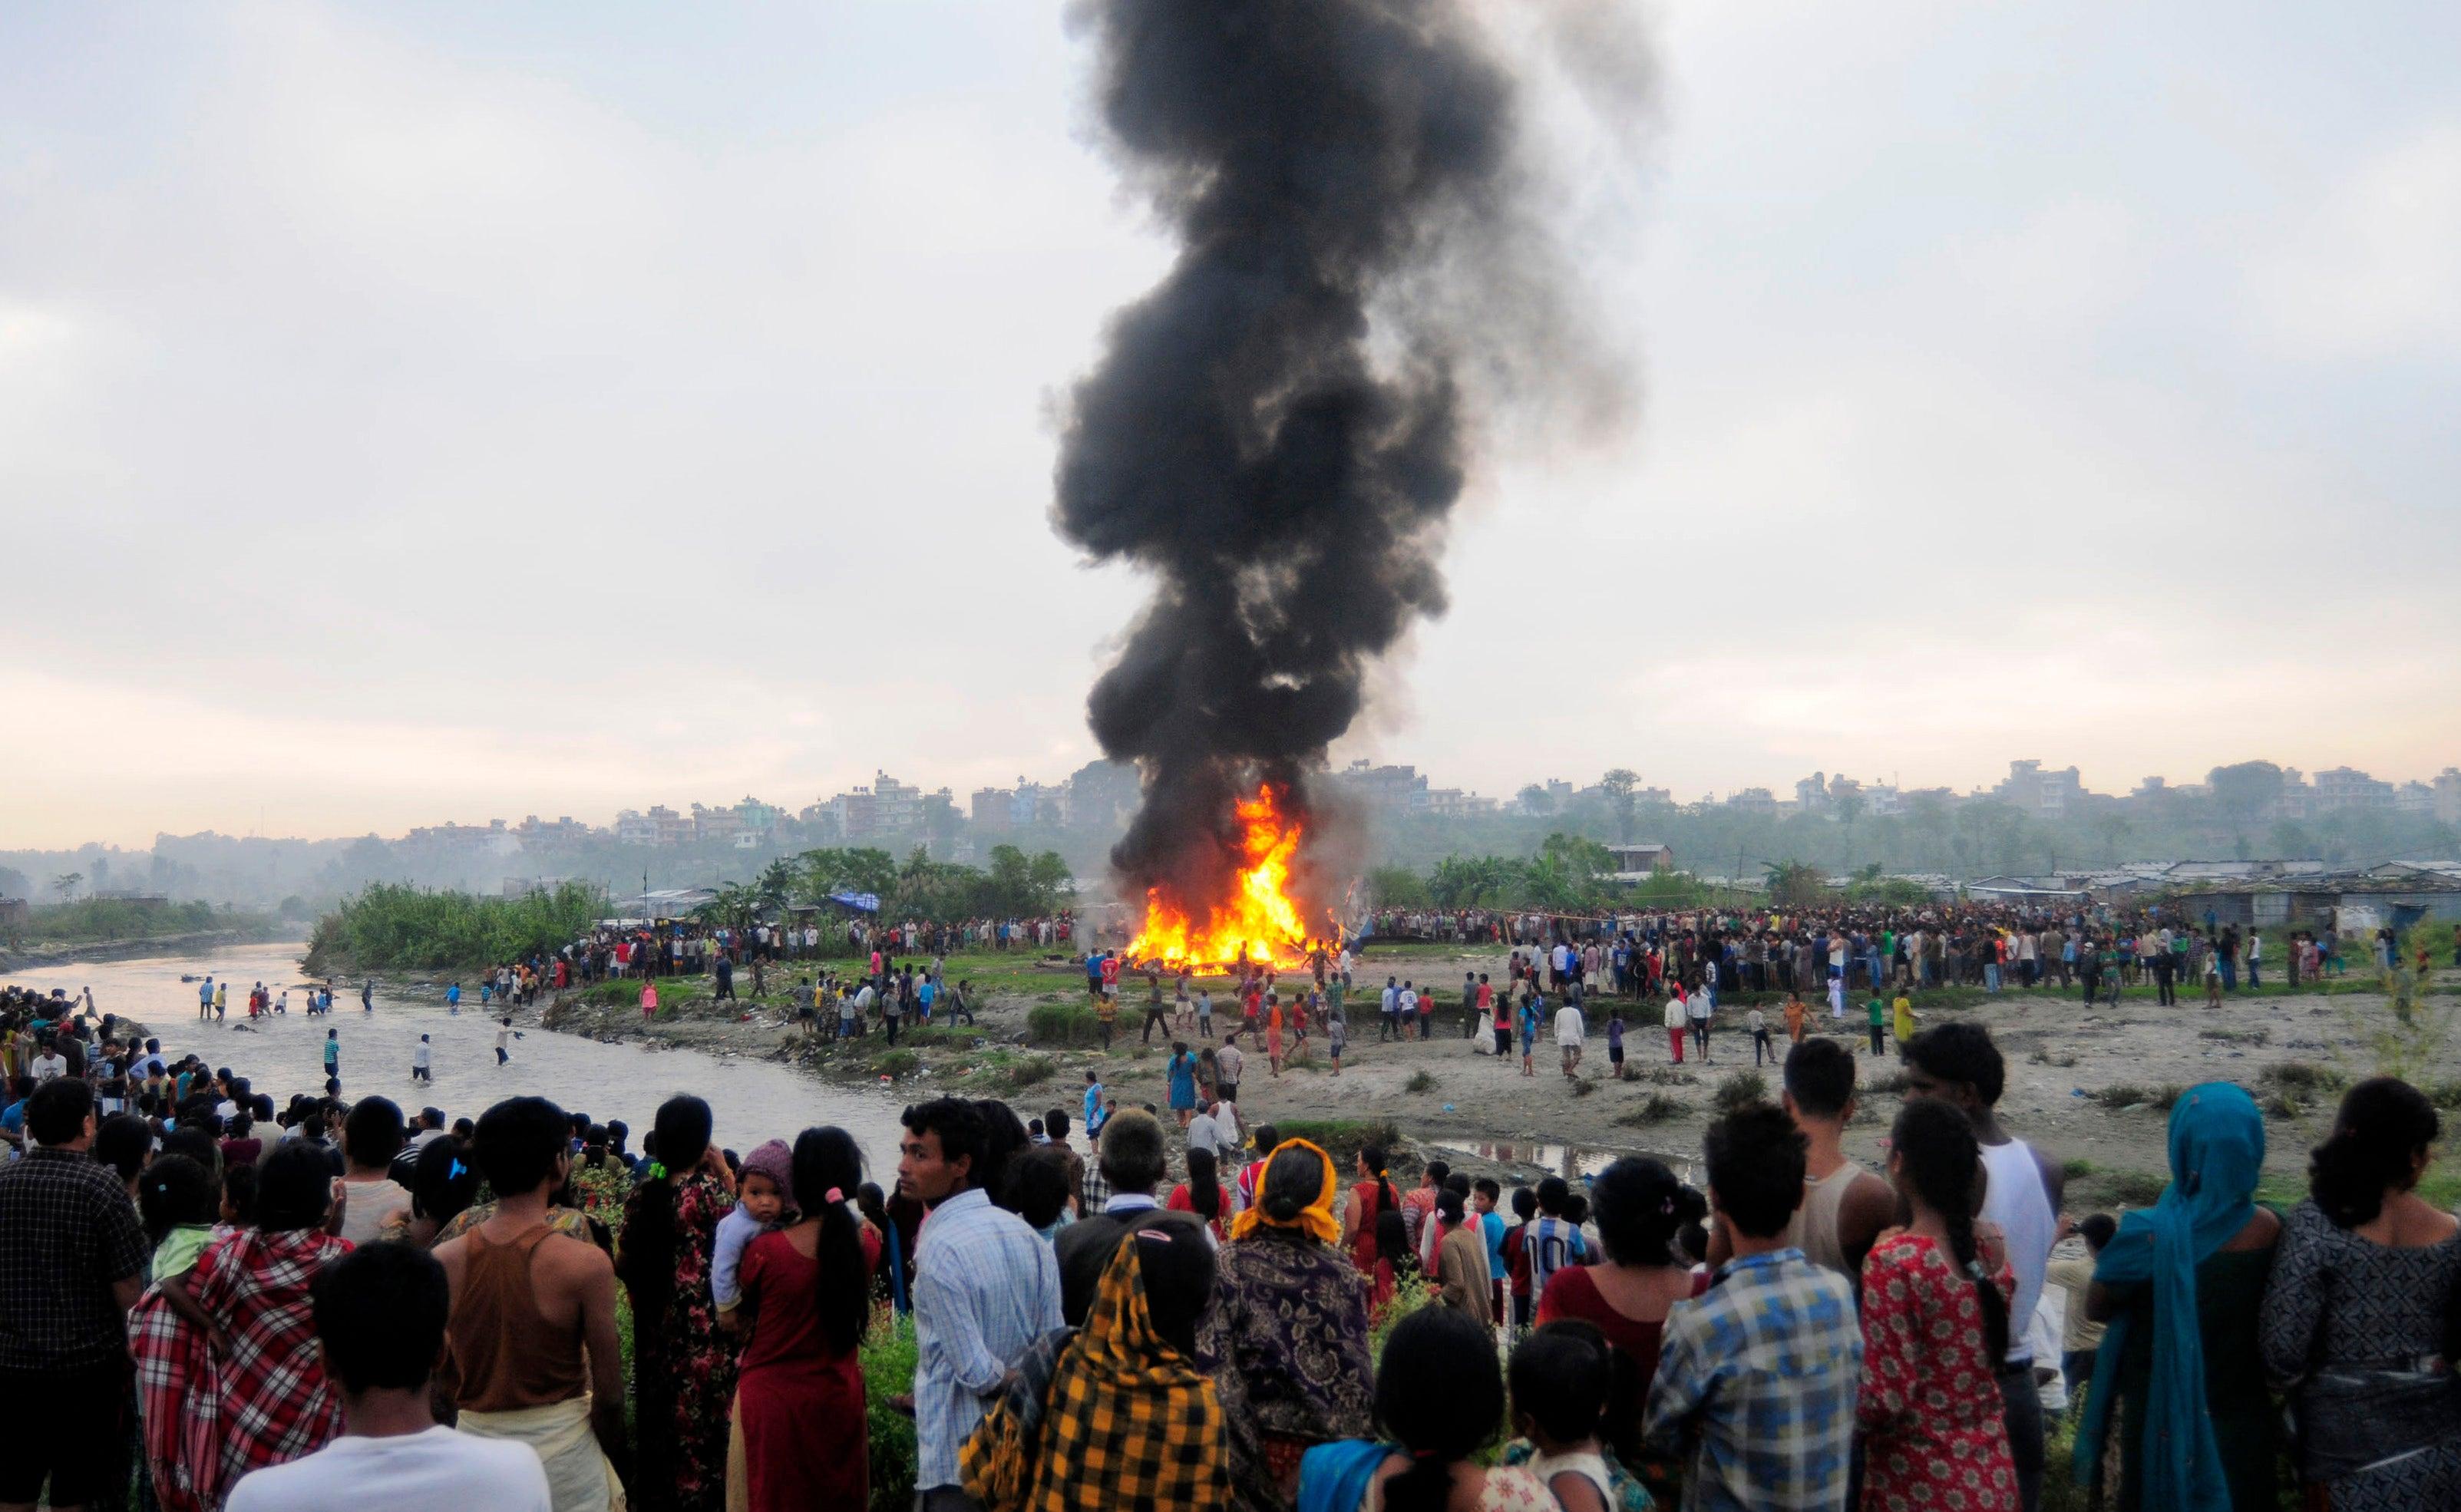 Plane Crashes Near Everest Region Kills 19 Fox News